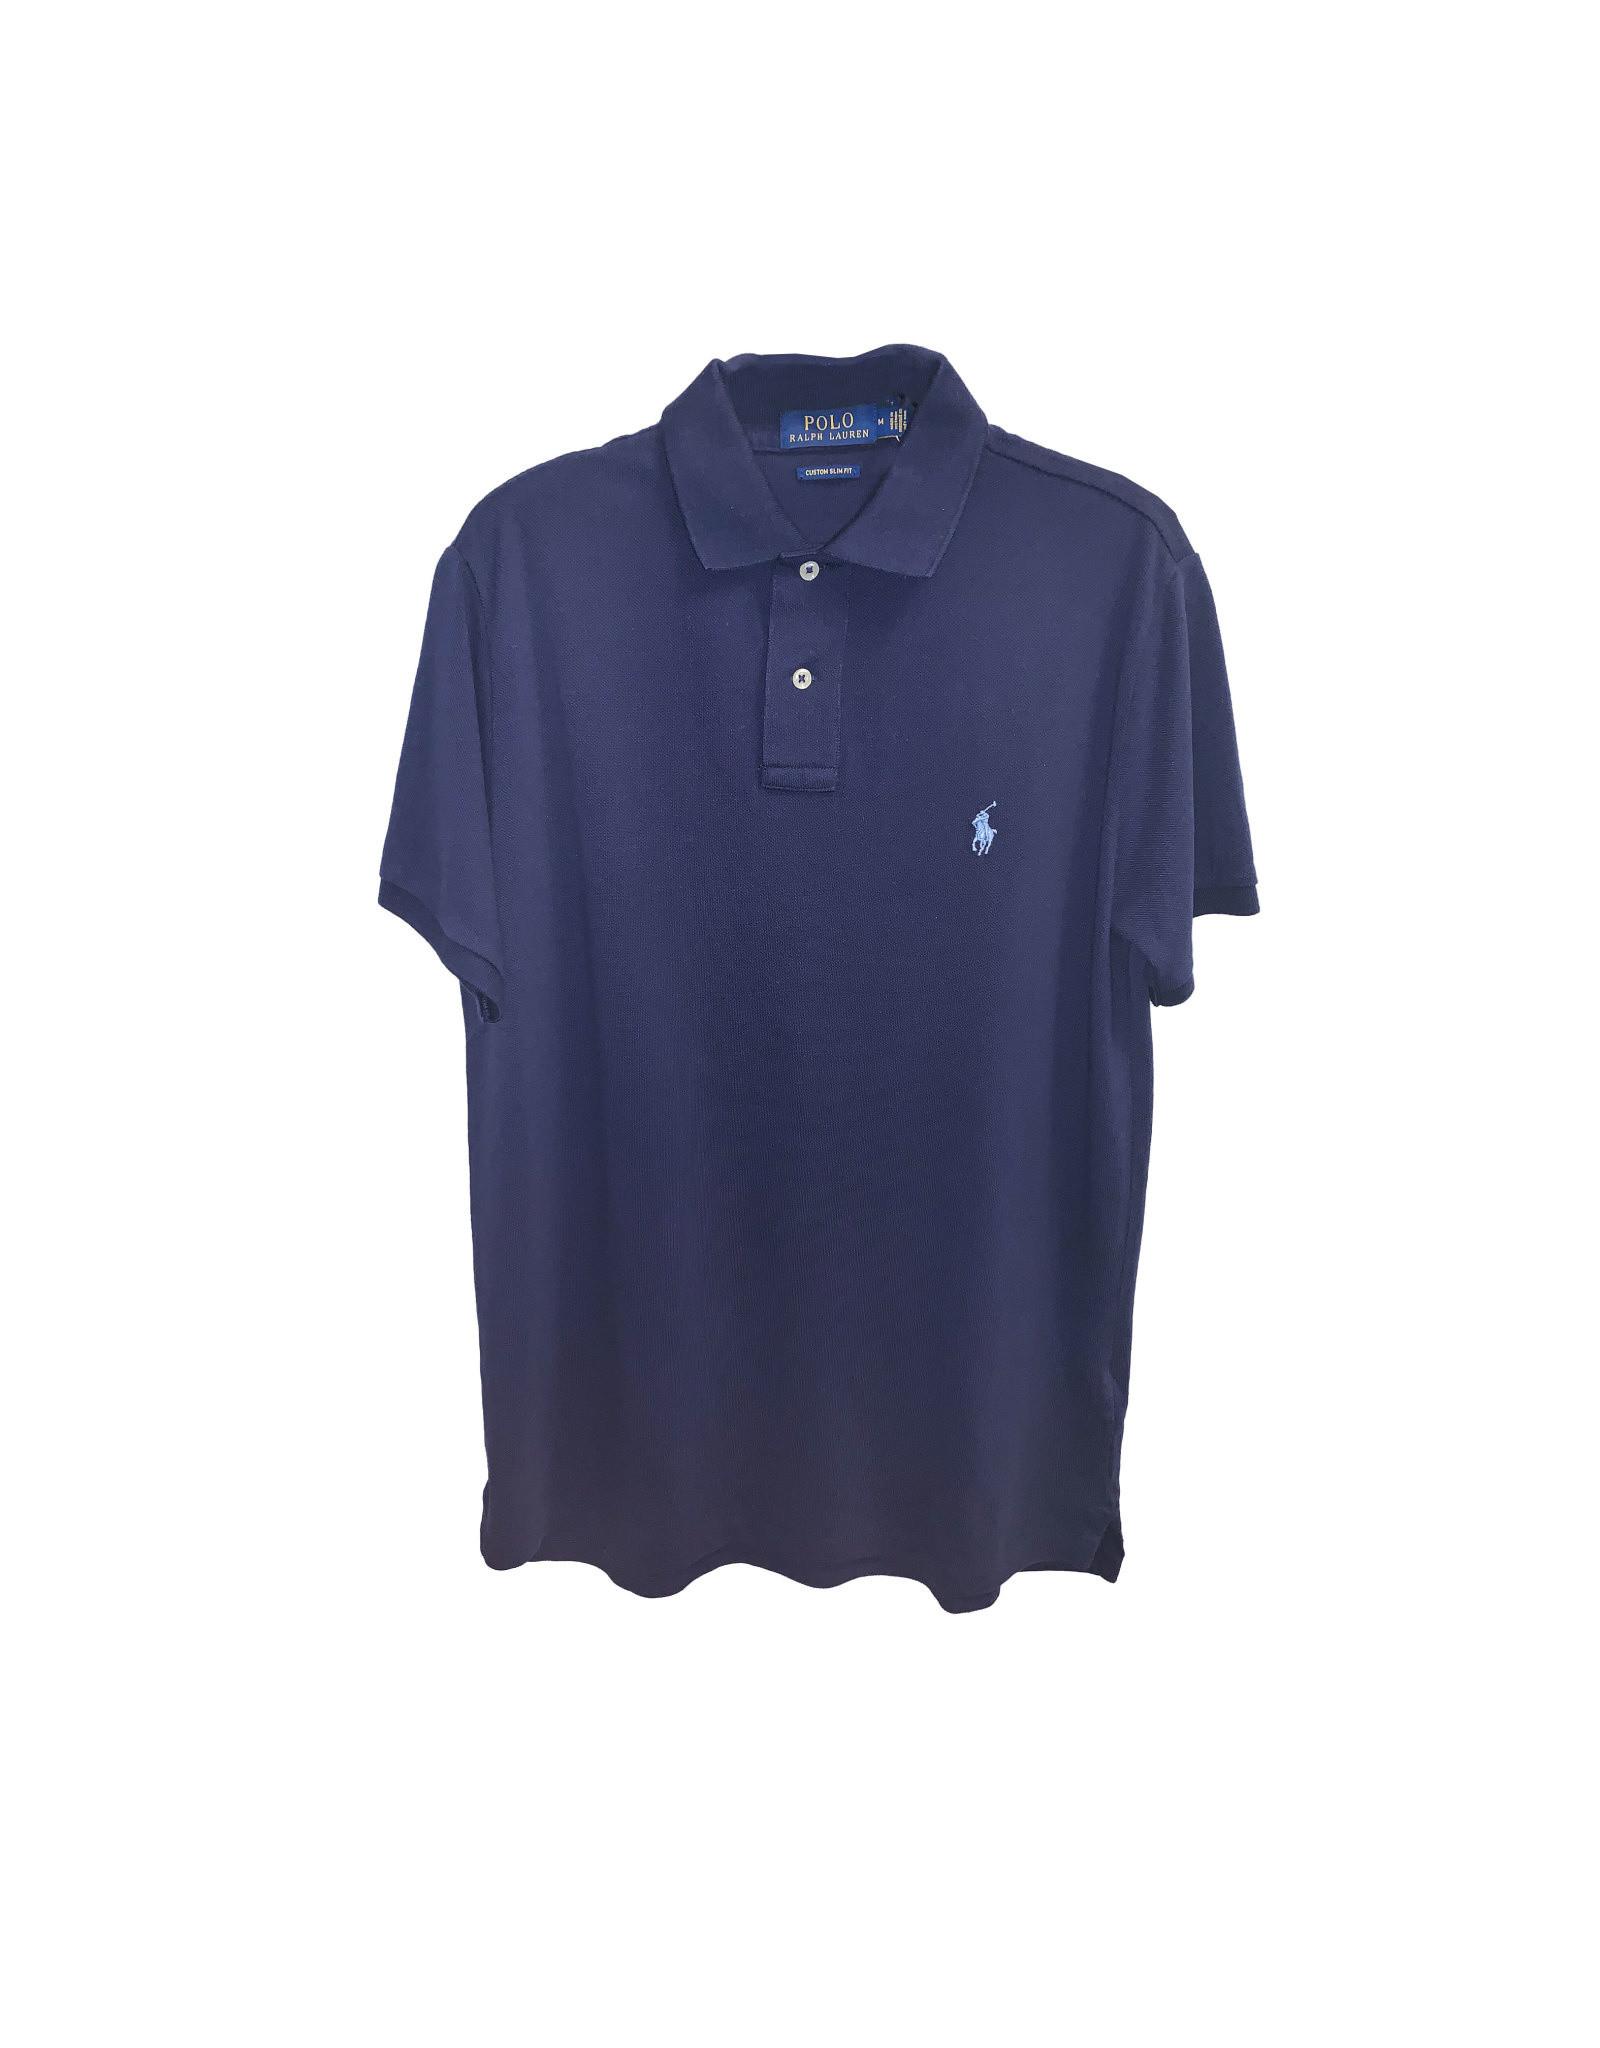 POLO RALPH LAUREN Polo Ralph  Lauren  Men's Short Sleve  T-shirt Size S